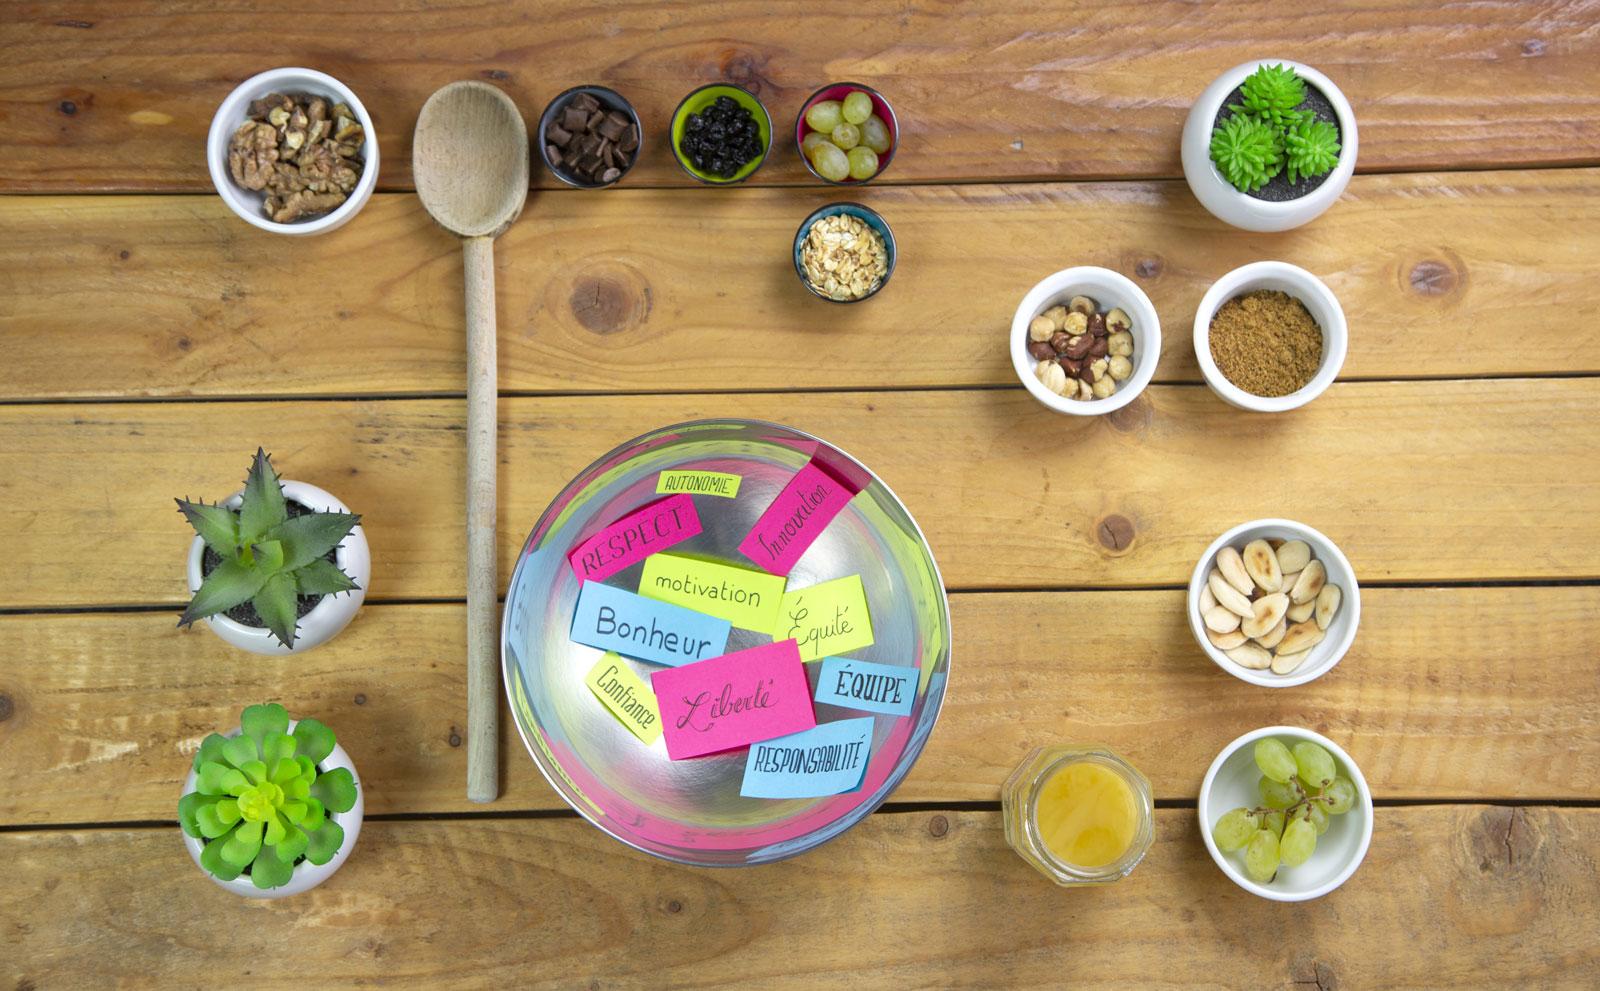 Transformer votre organisation - les ingrédients